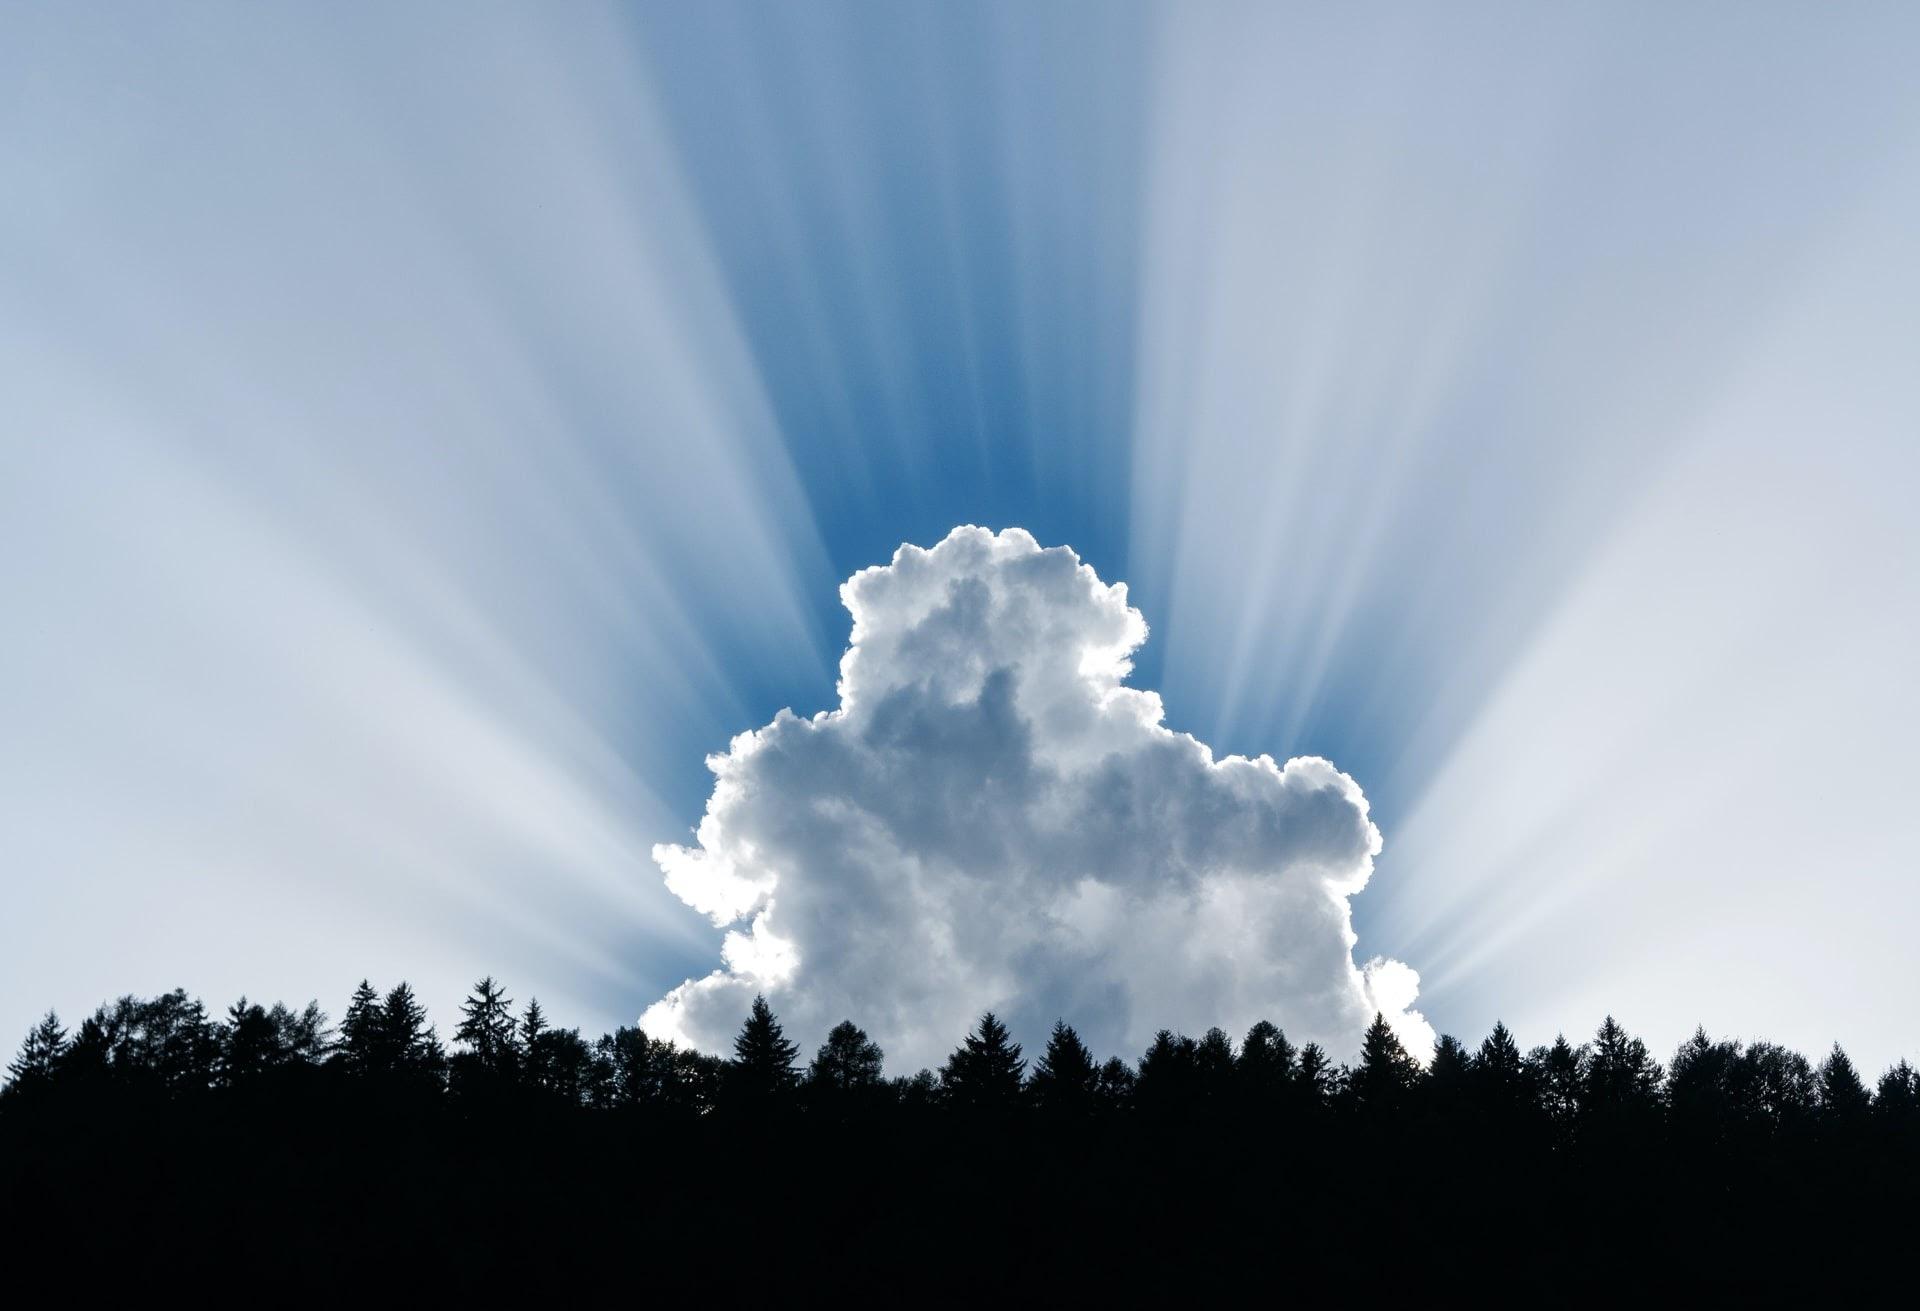 a cloud raising over treetops